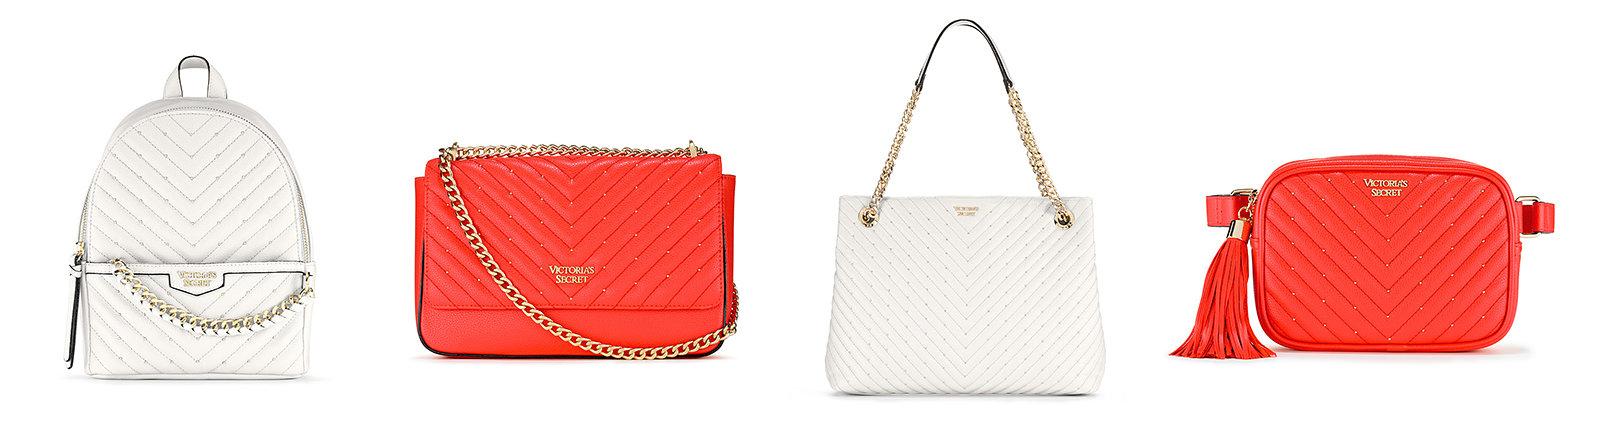 Accessories & Bags - Victoria's Secret